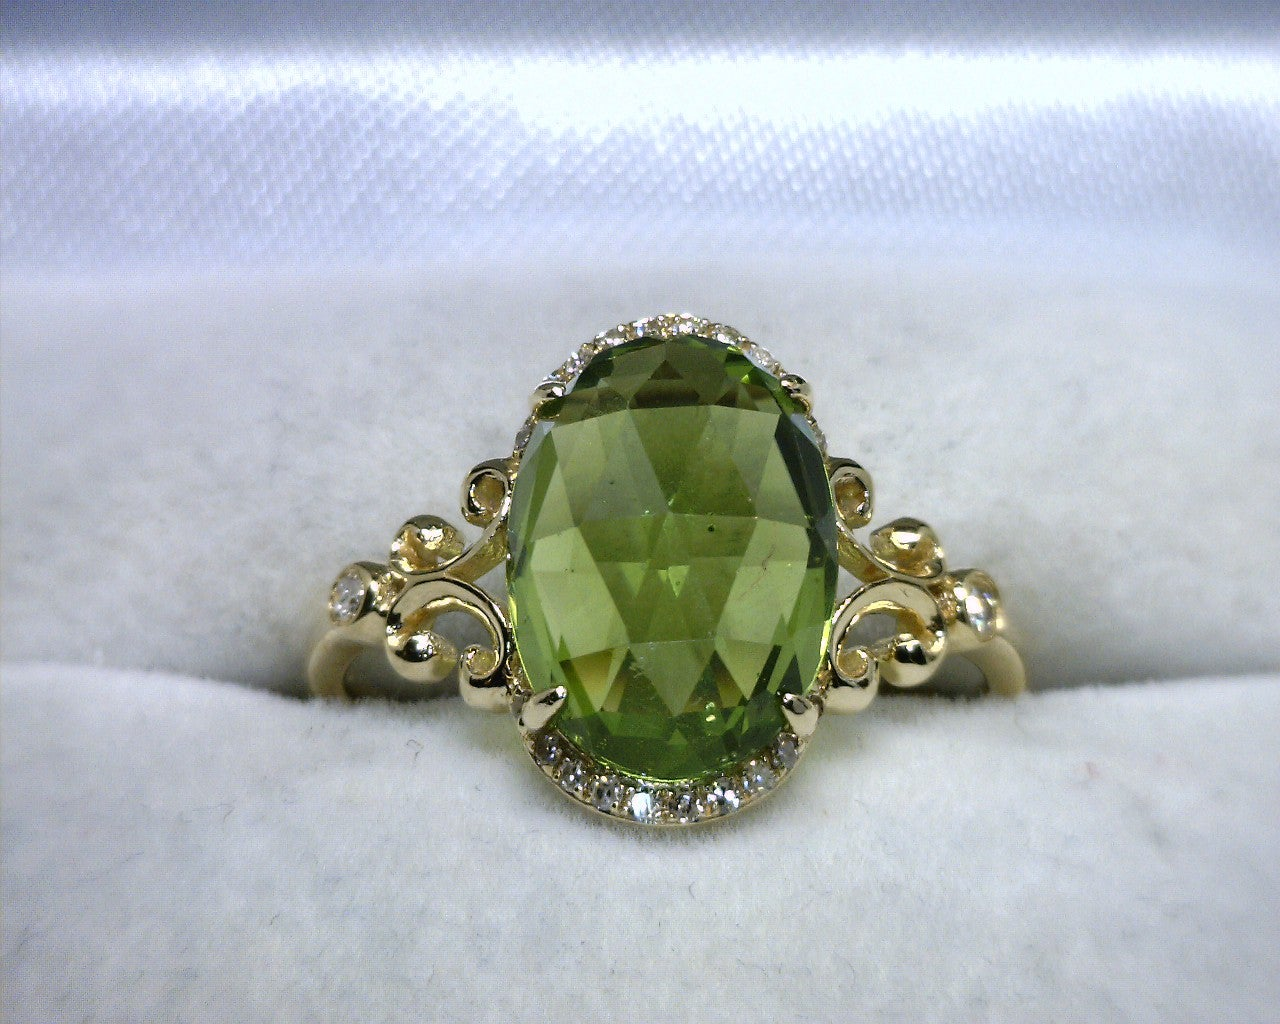 RG Jewelers — 14K Yellow Gold Peridot / Diamond Ring